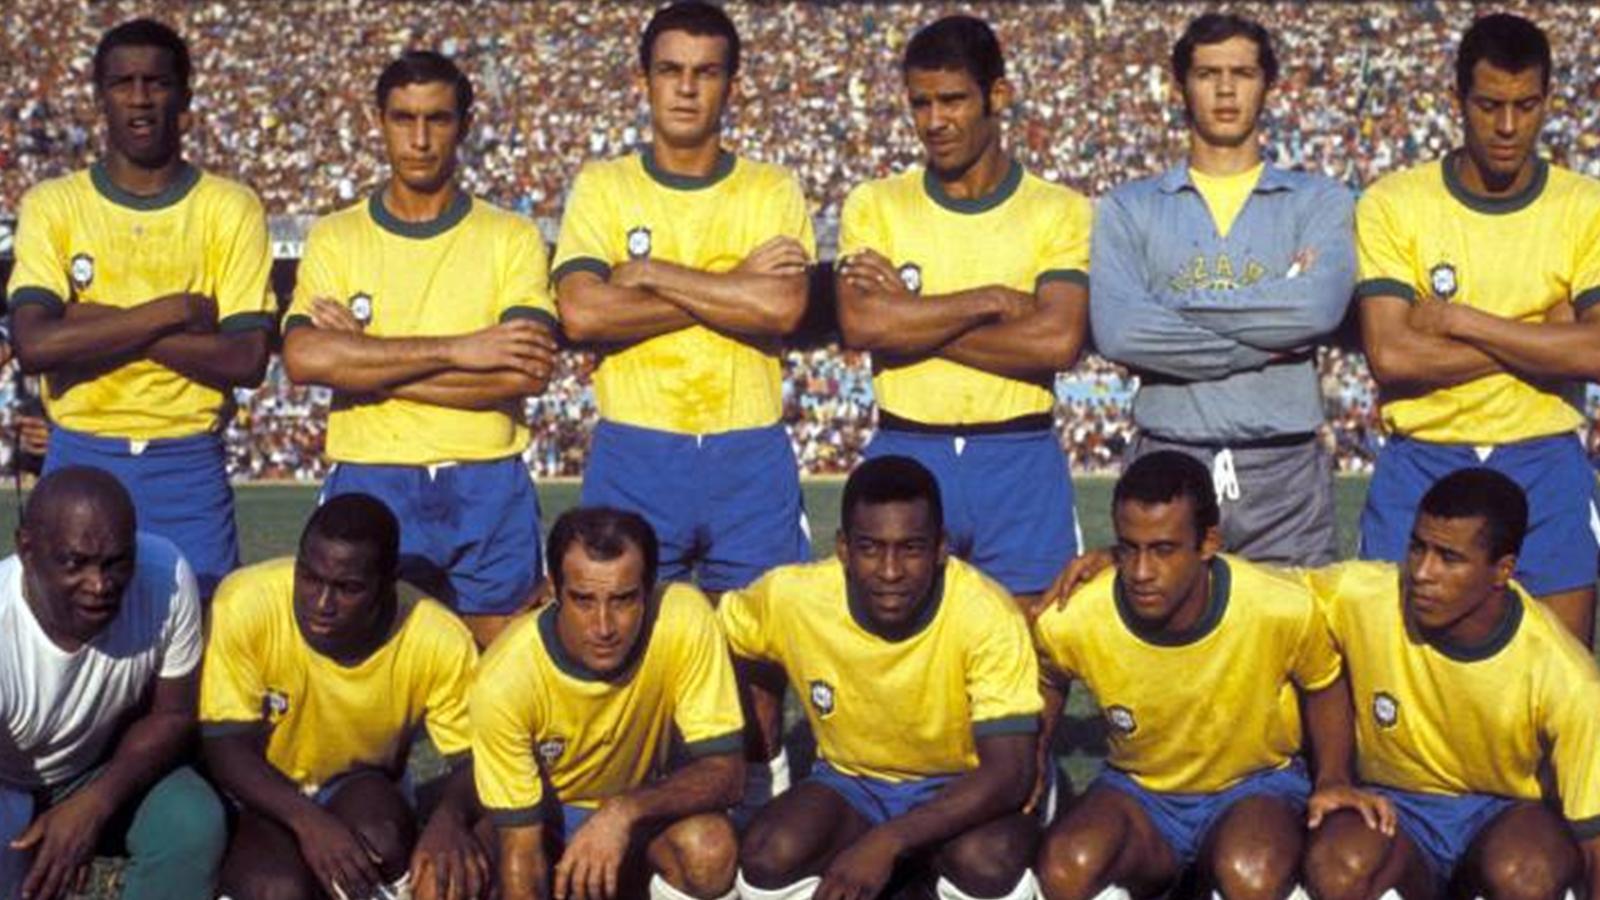 Br sil 1970 italie 1982 coupe du monde 2006 football eurosport - Coupe du monde de foot 1982 ...